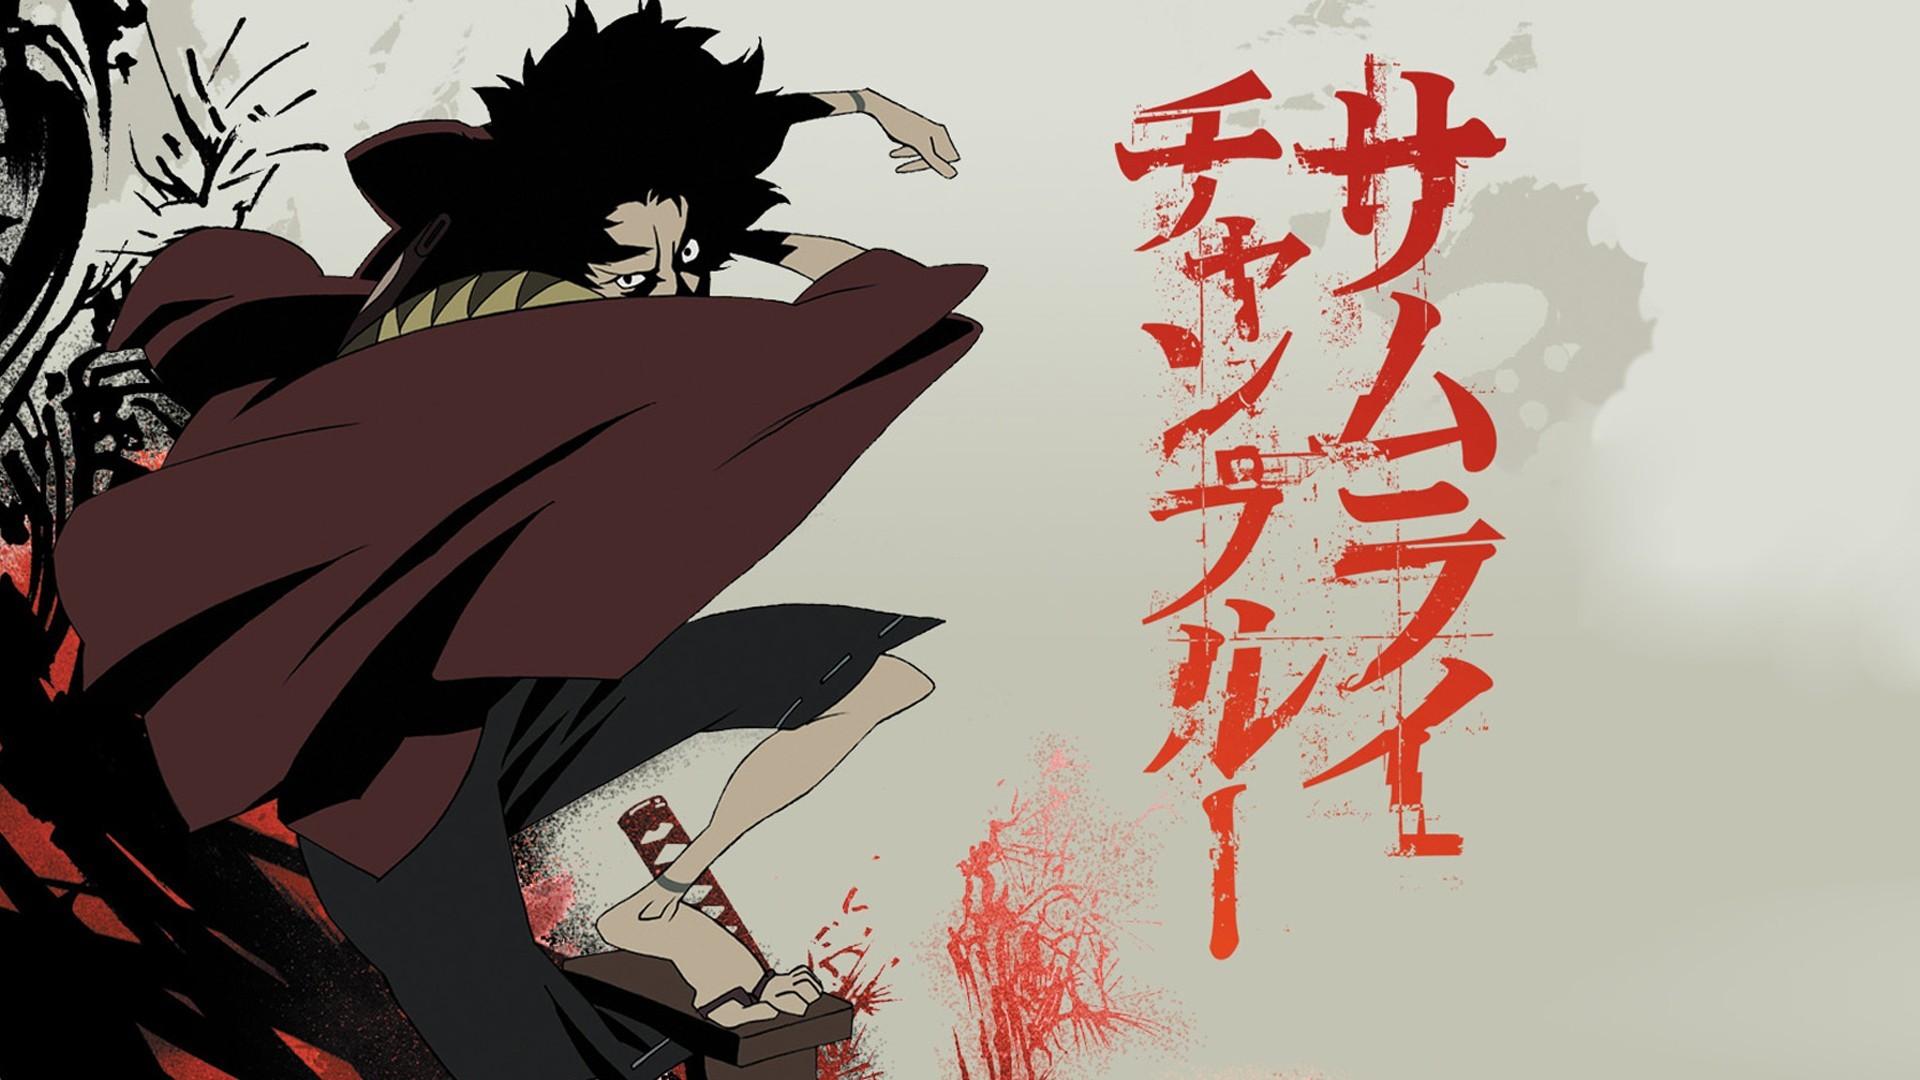 Anime Samurai Champloo Mugen anime illustration